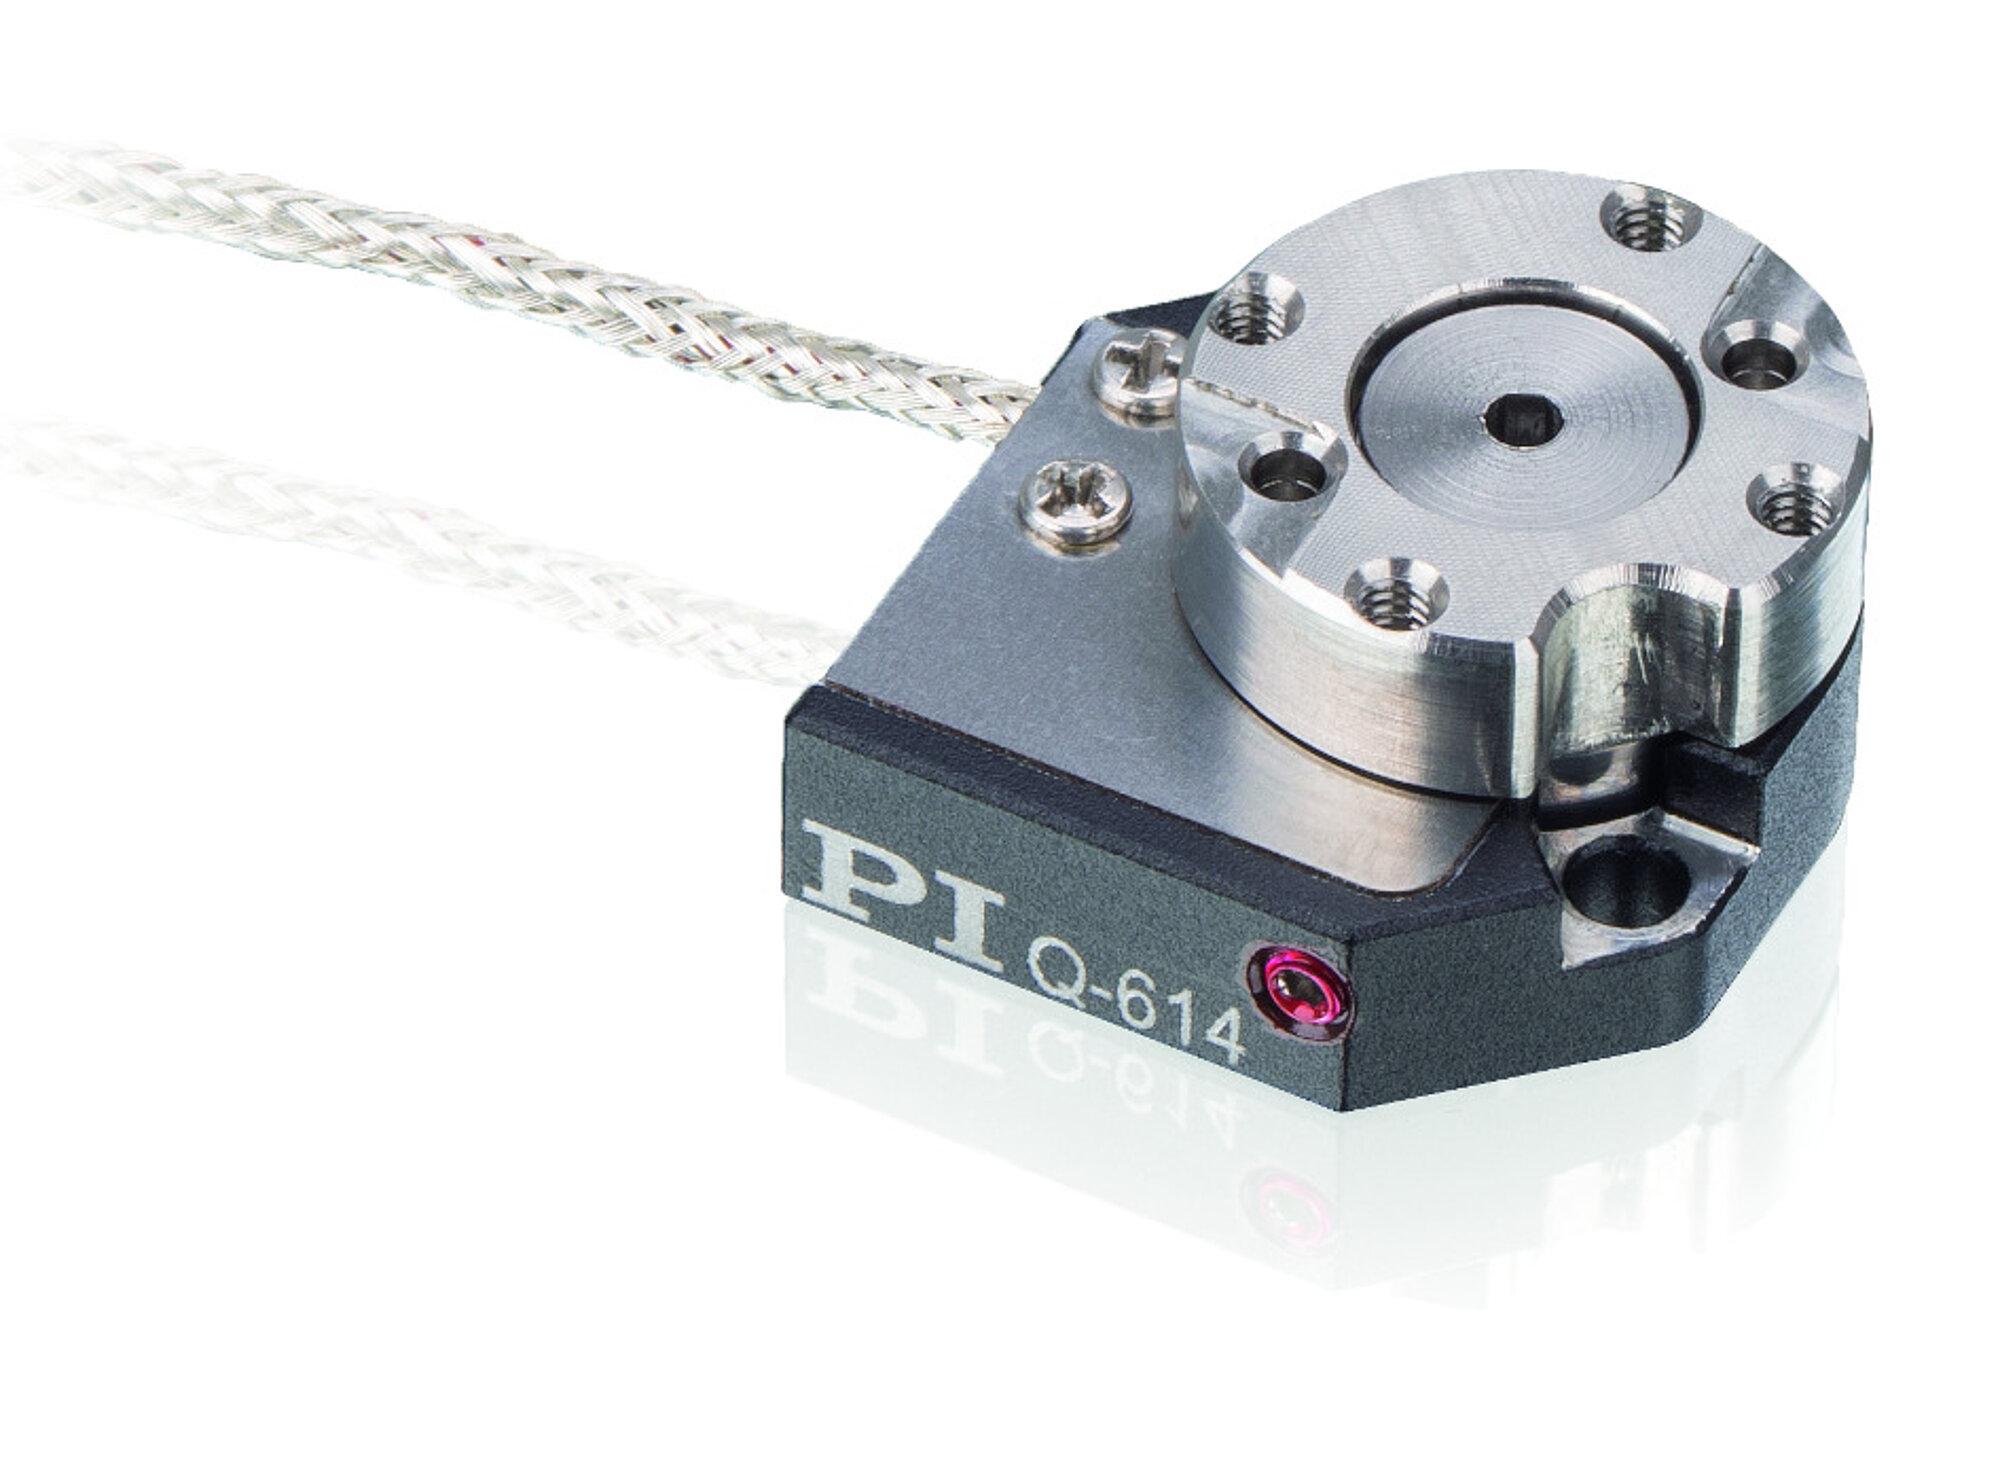 Gut gemocht Q-614 Q-Motion® Miniatur-Rotationstisch SZ62